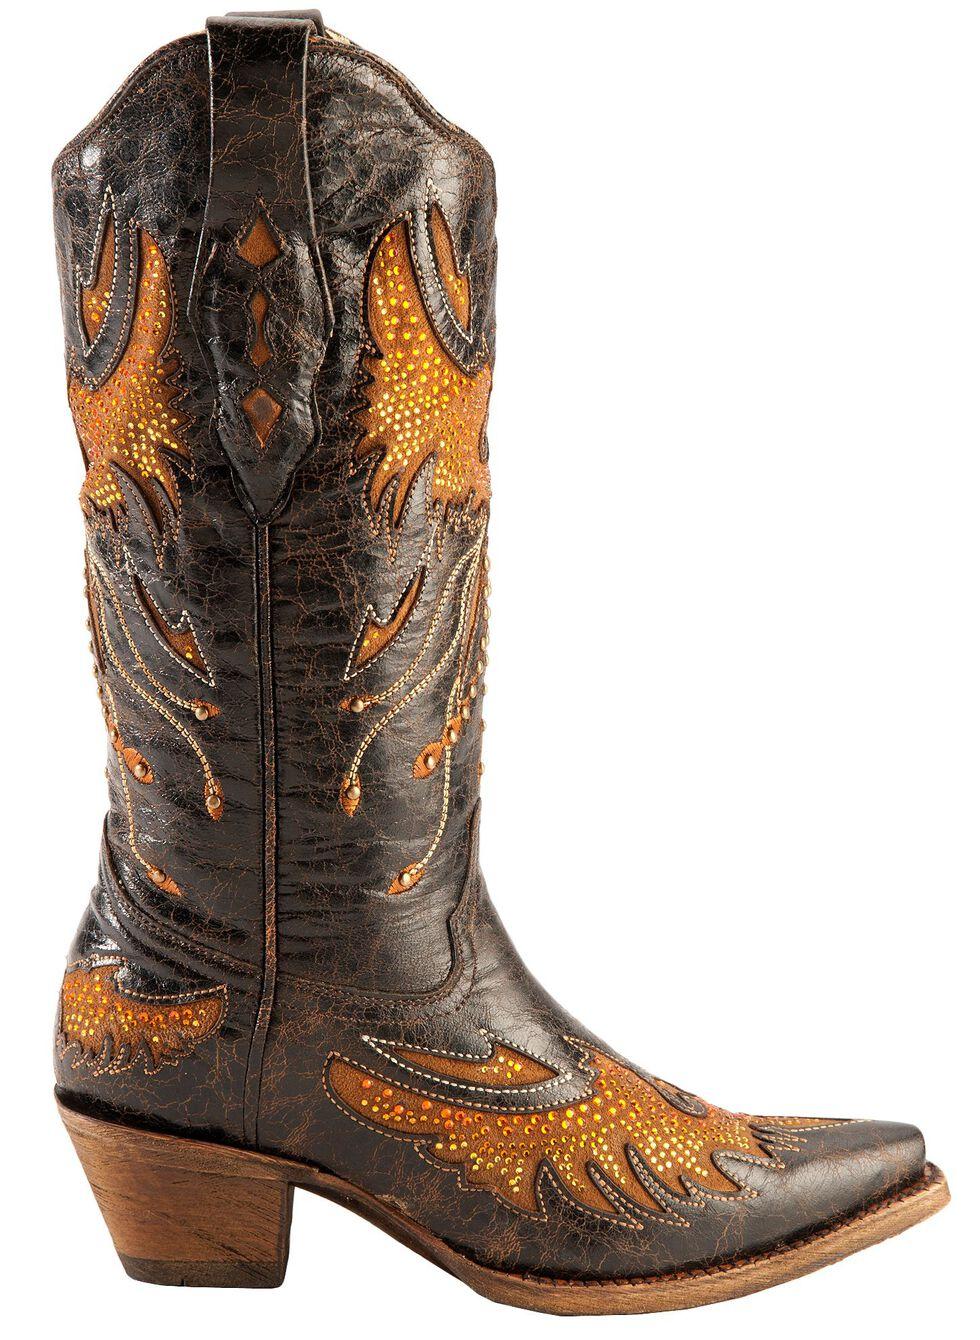 Corral Distressed Eagle Inlay Orange Rhinestone Cowgirl Boots - Snip Toe, Black, hi-res